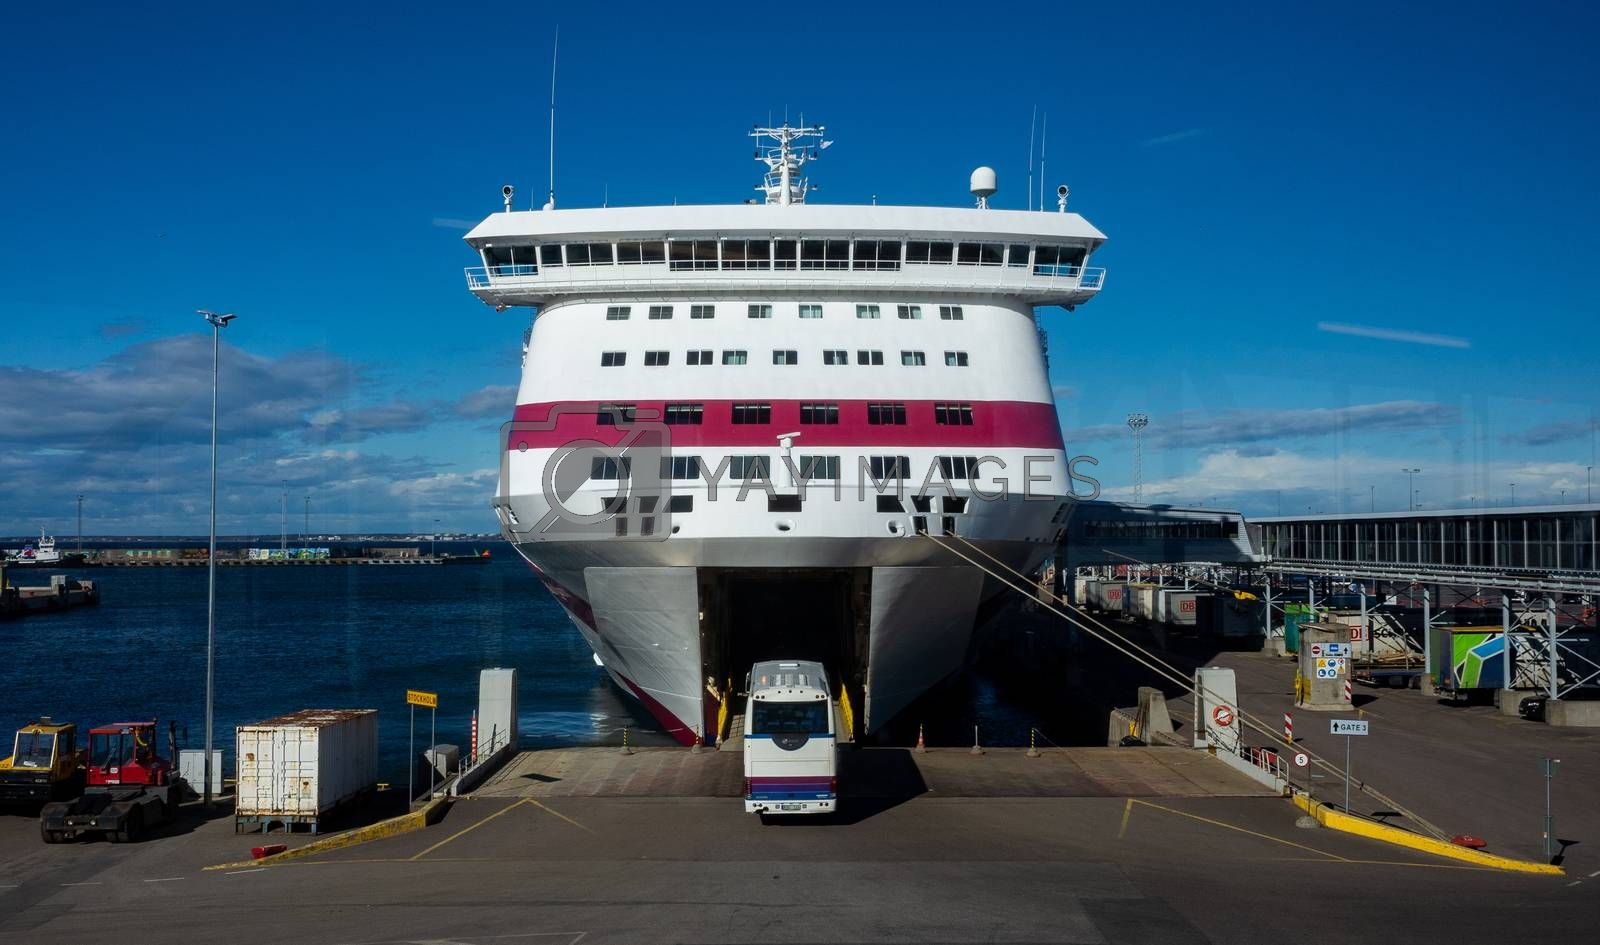 23 April 2019, Tallinn, Estonia. Passenger bus calls in high-speed passenger and car ferry of the Estonian shipping concern Tallink Baltic Queen in the port of Tallinn.